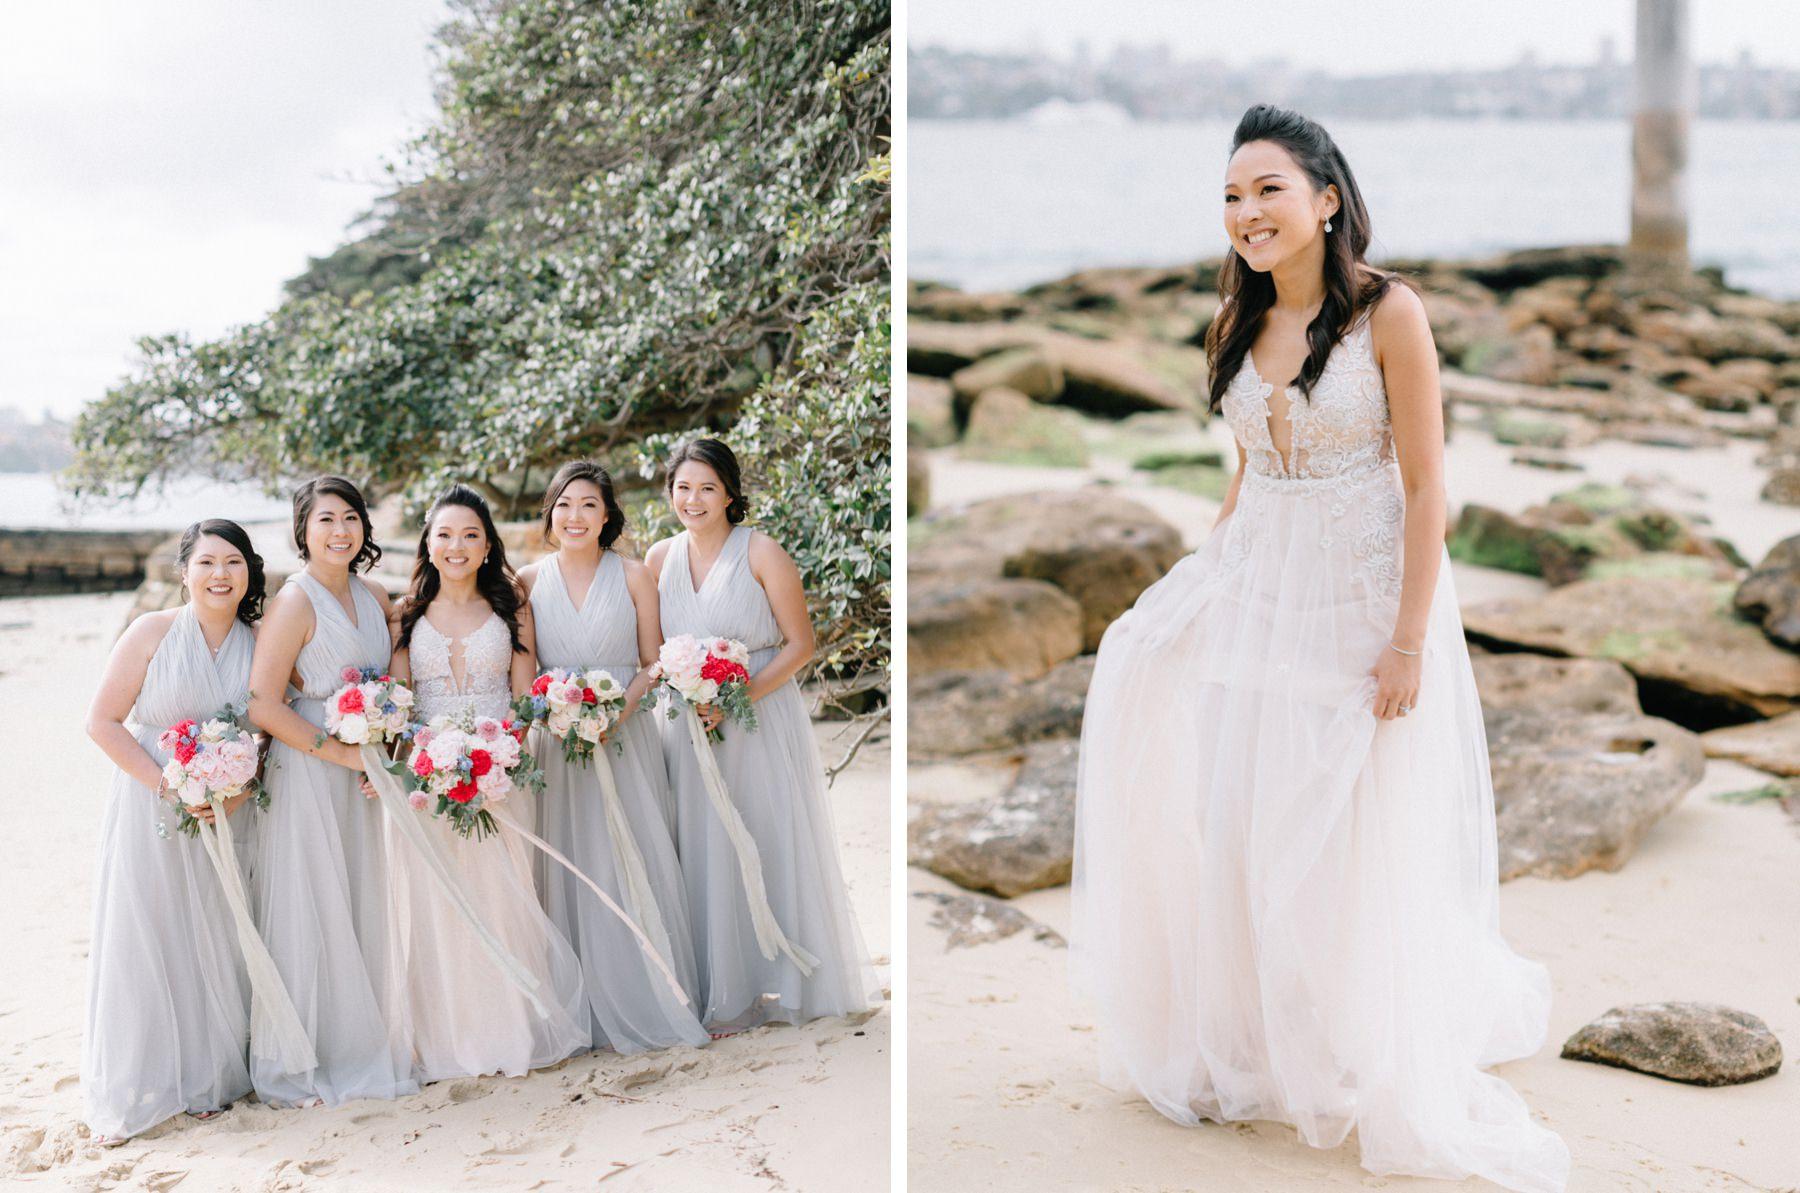 sydney wedding makeup by sophie lau